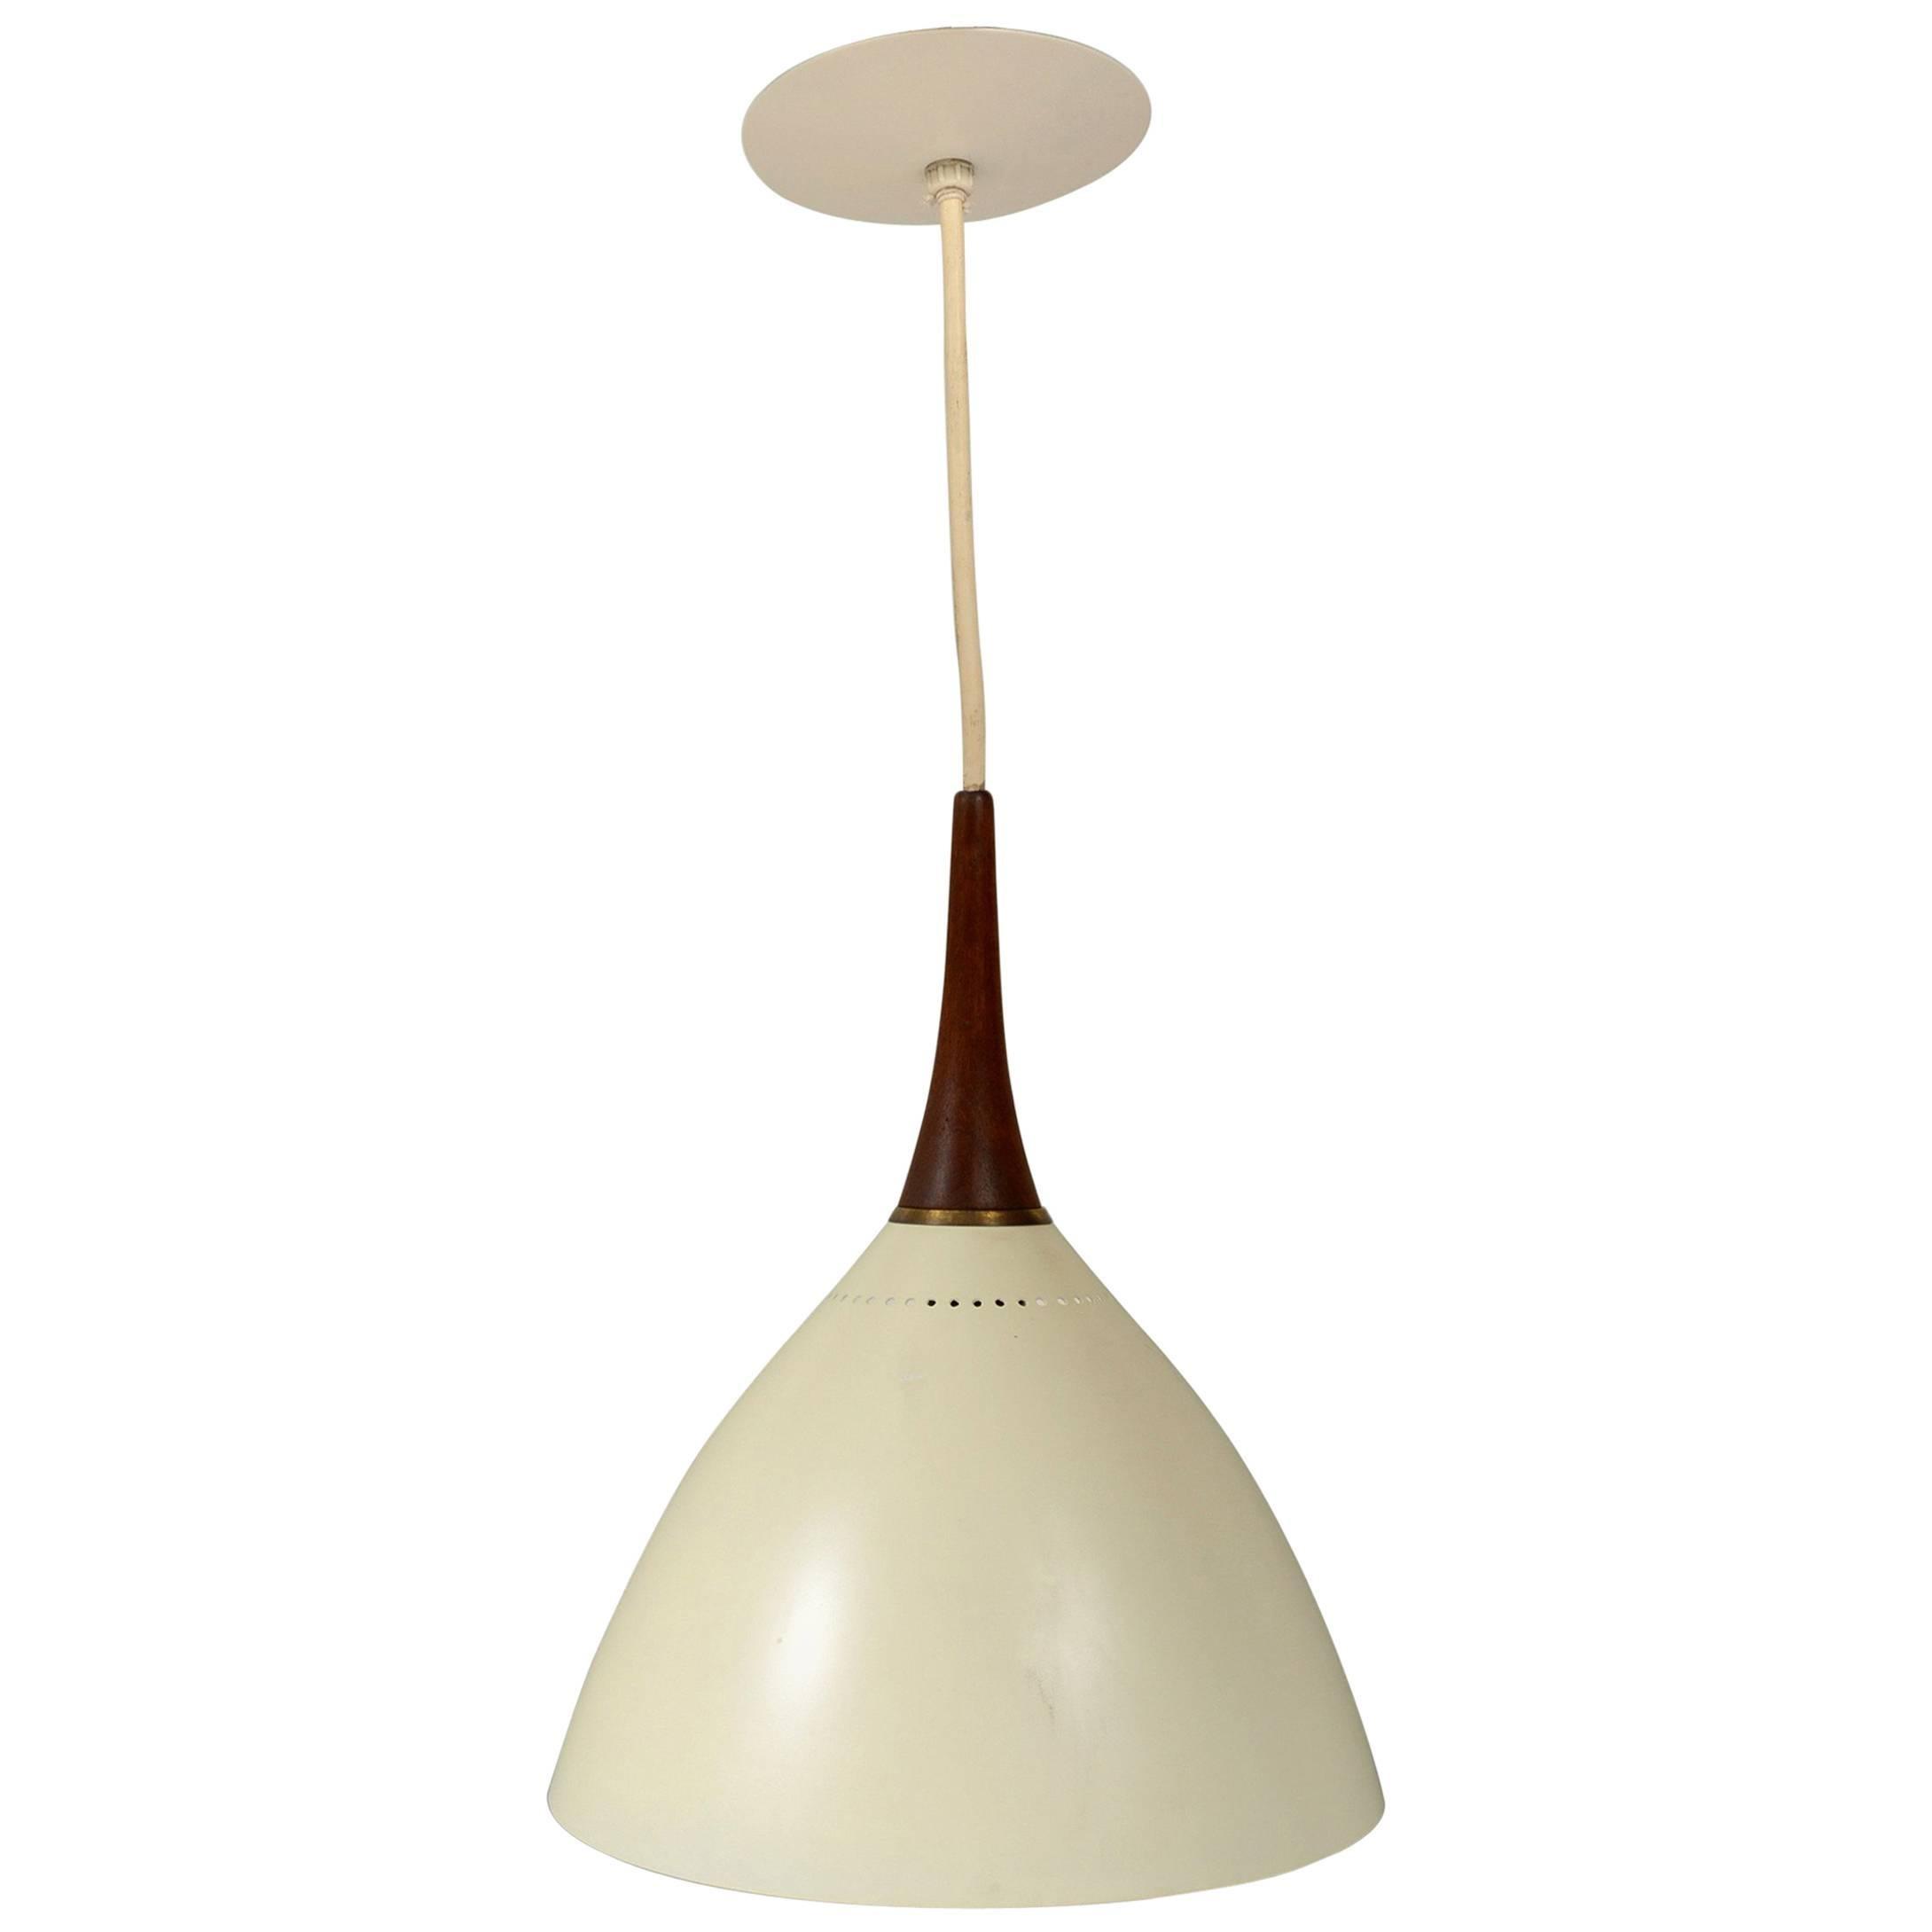 Scandinavian Light Fixture Hanging